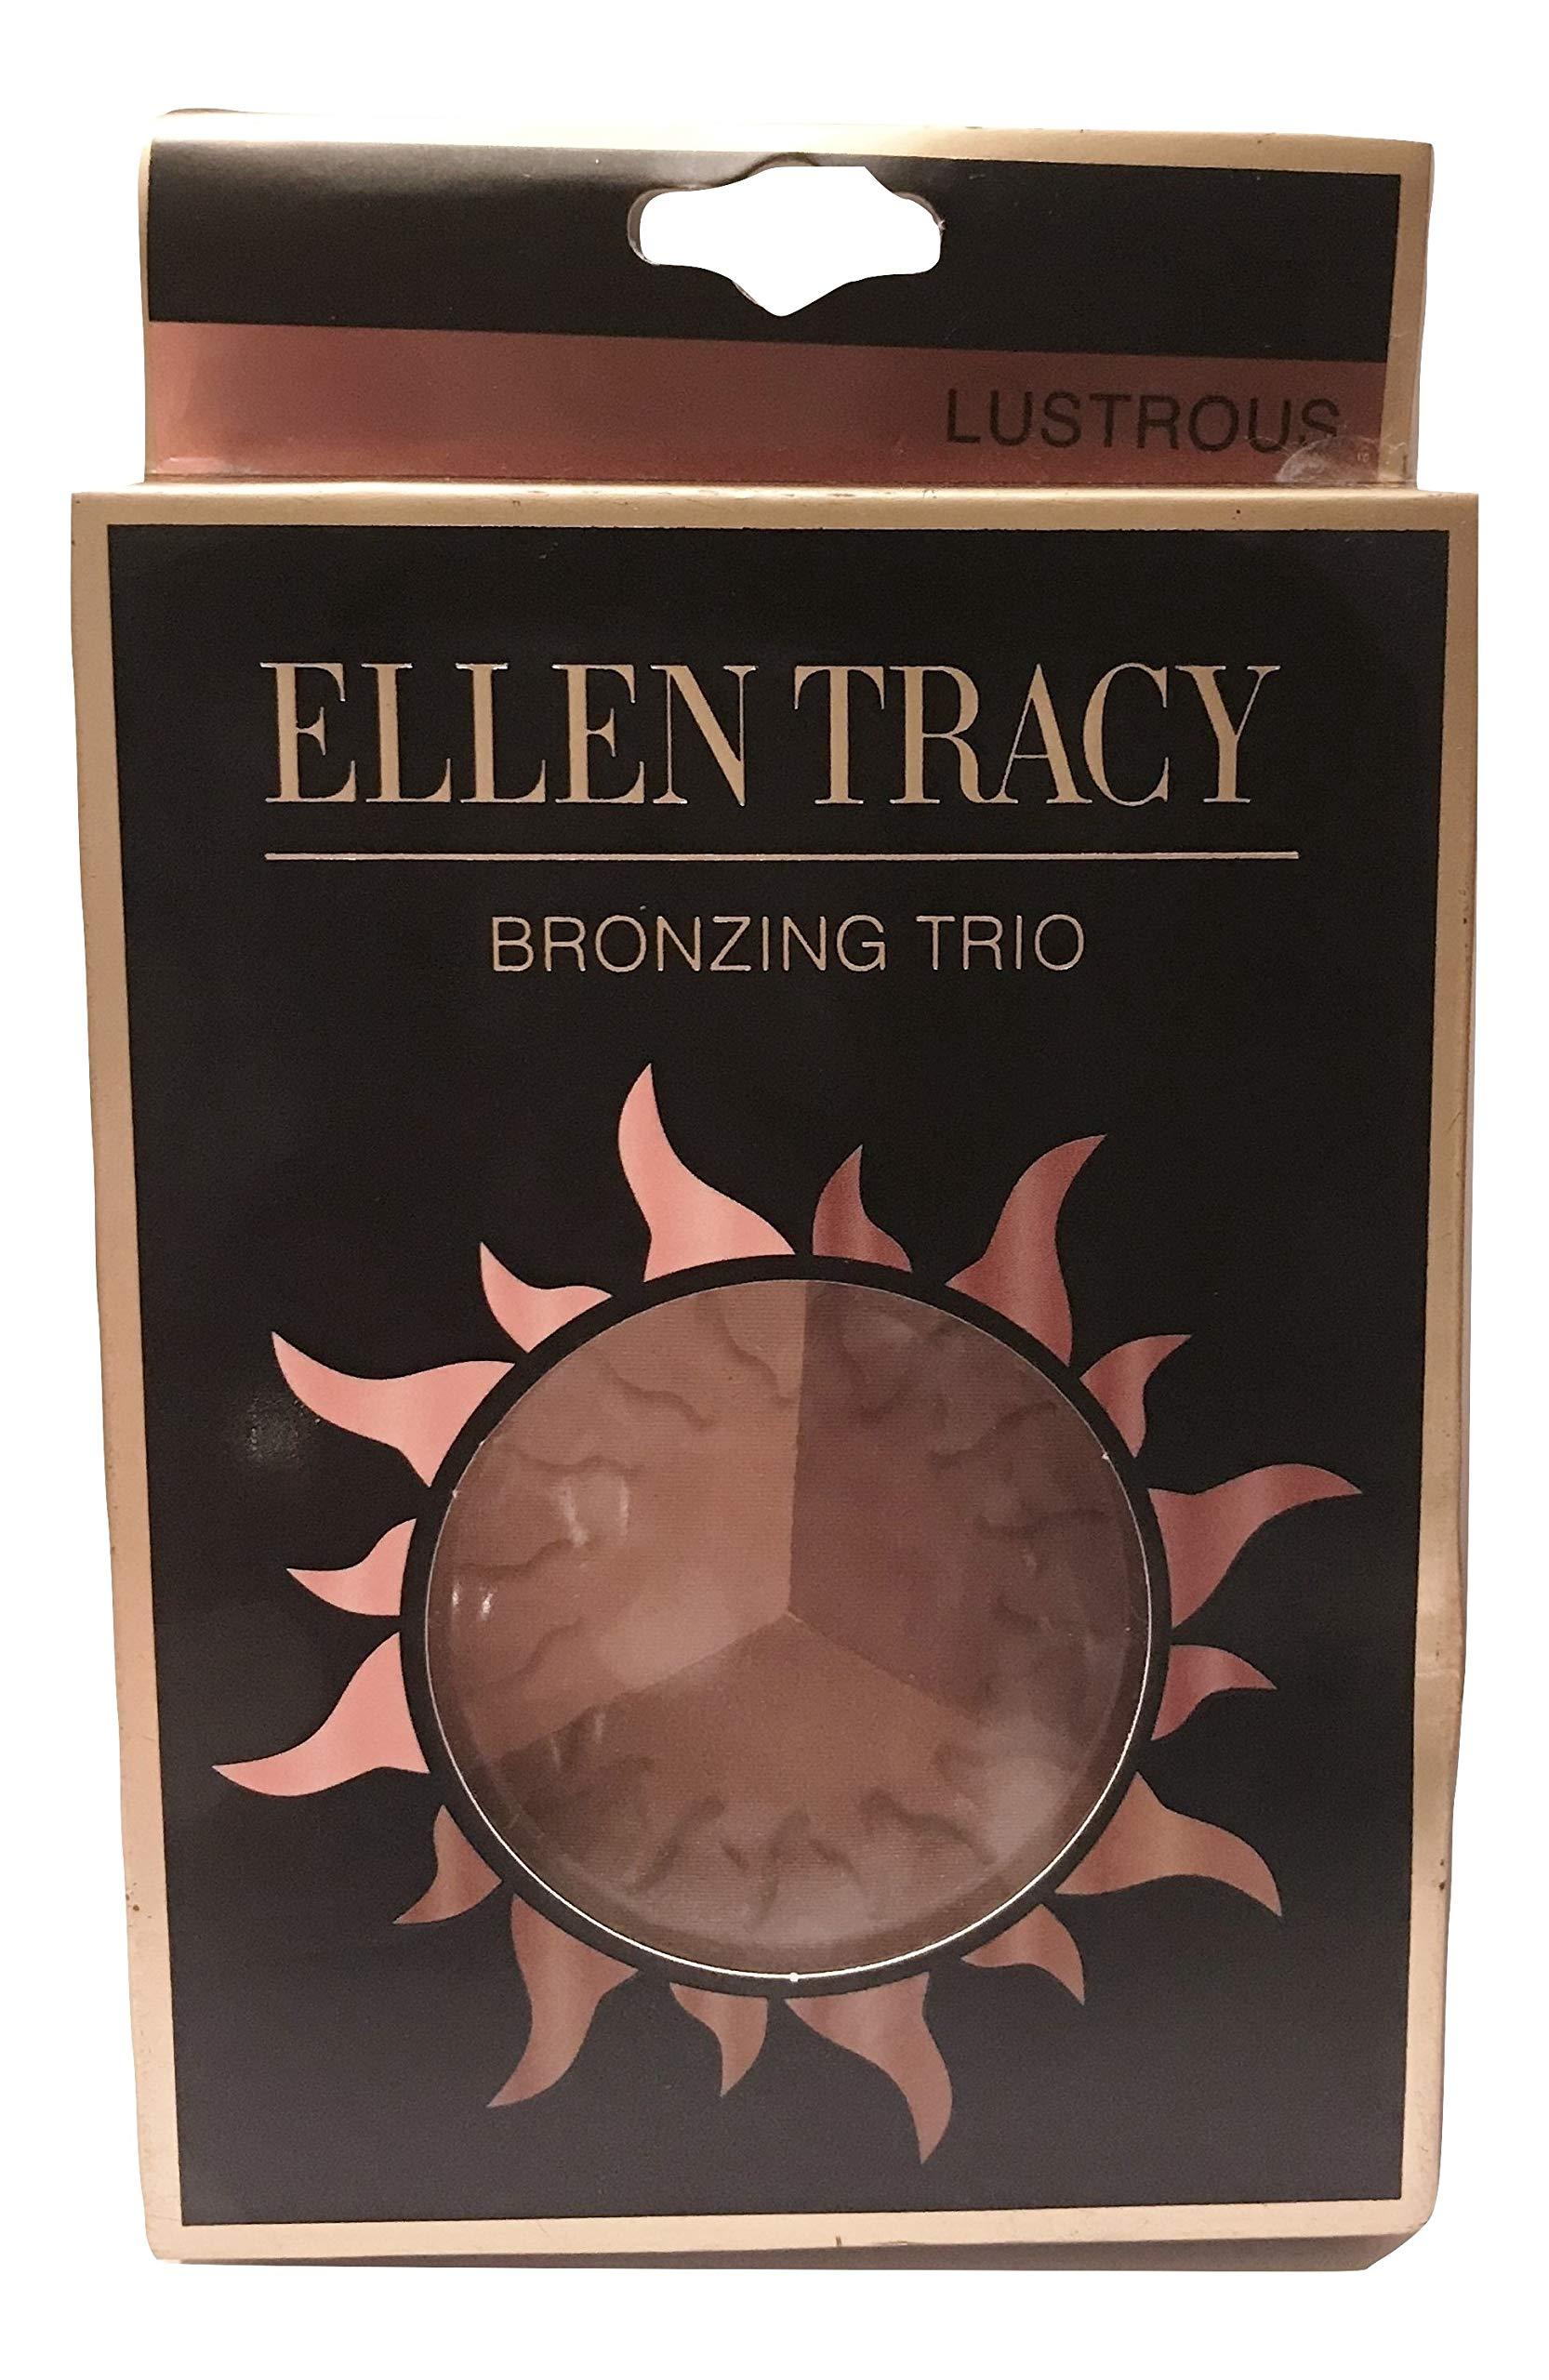 Ellen Tracy Lustrous Bronzing Trio